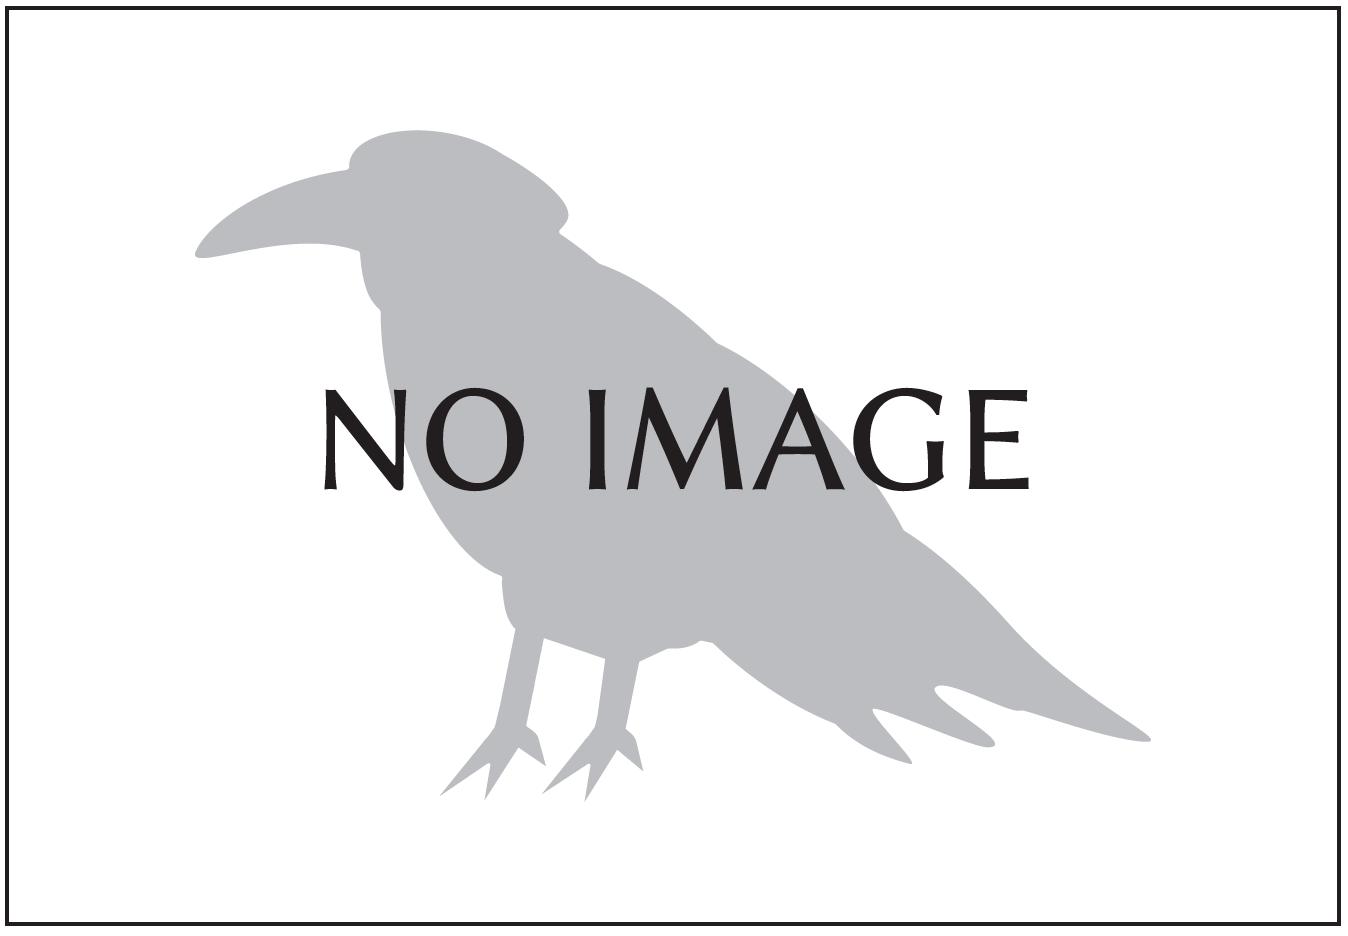 北大構成員6人が感染 12月前半発表分 -新型コロナ